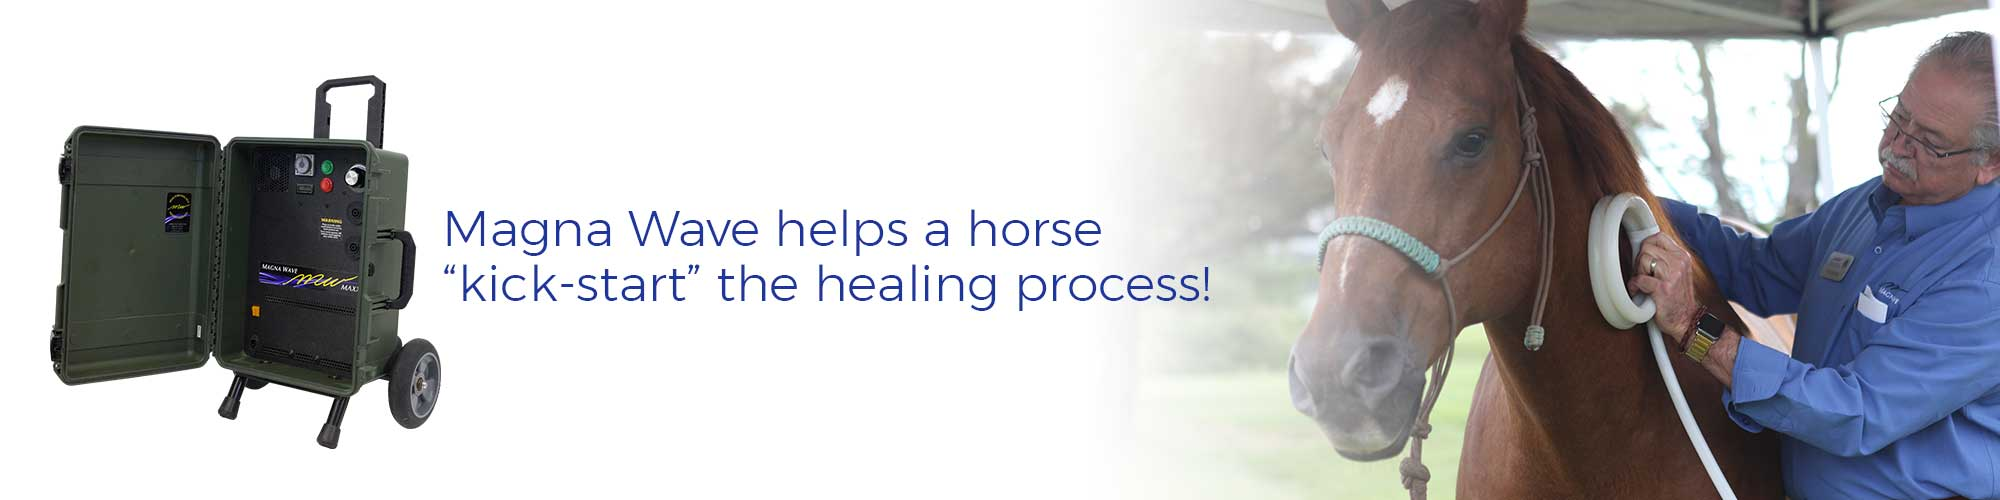 "Magna Wave helps a horse ""kick-start"" the healing process!"